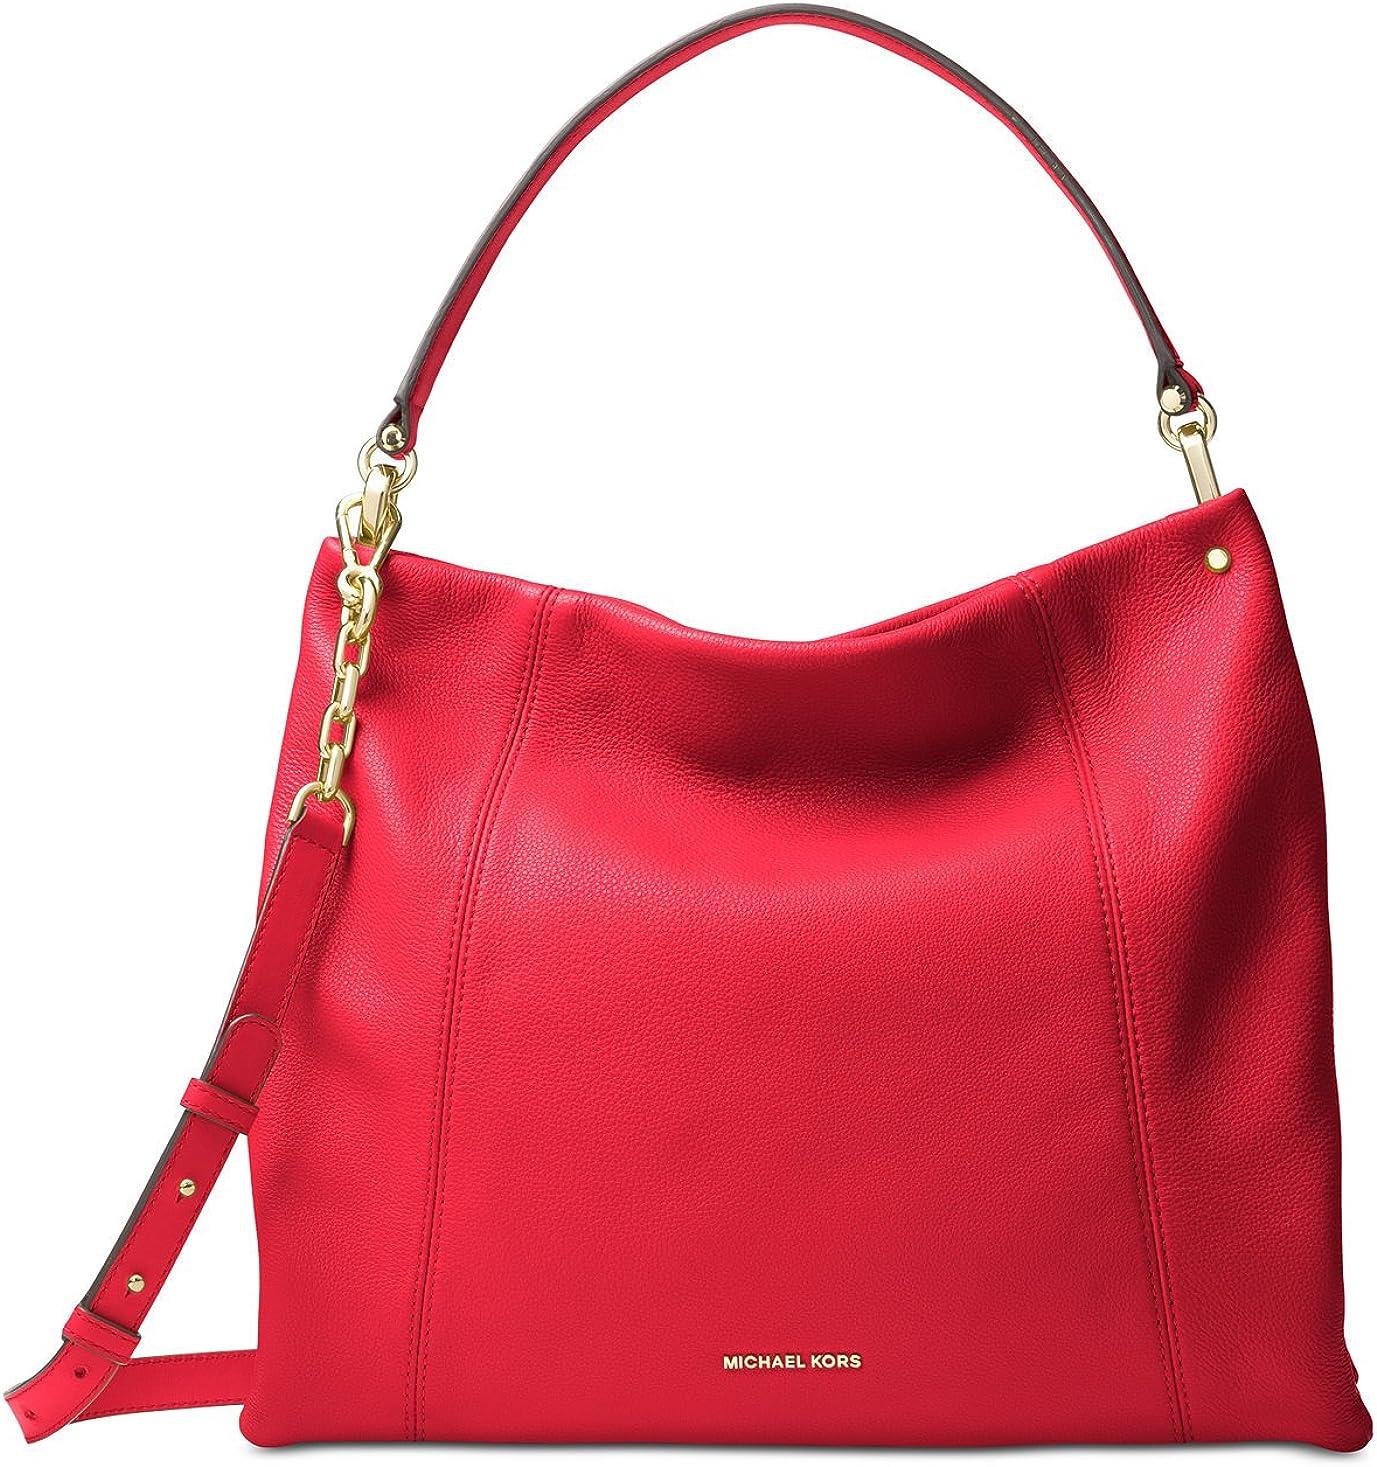 : Michael Kors Lex Large Convertible Hobo Bag